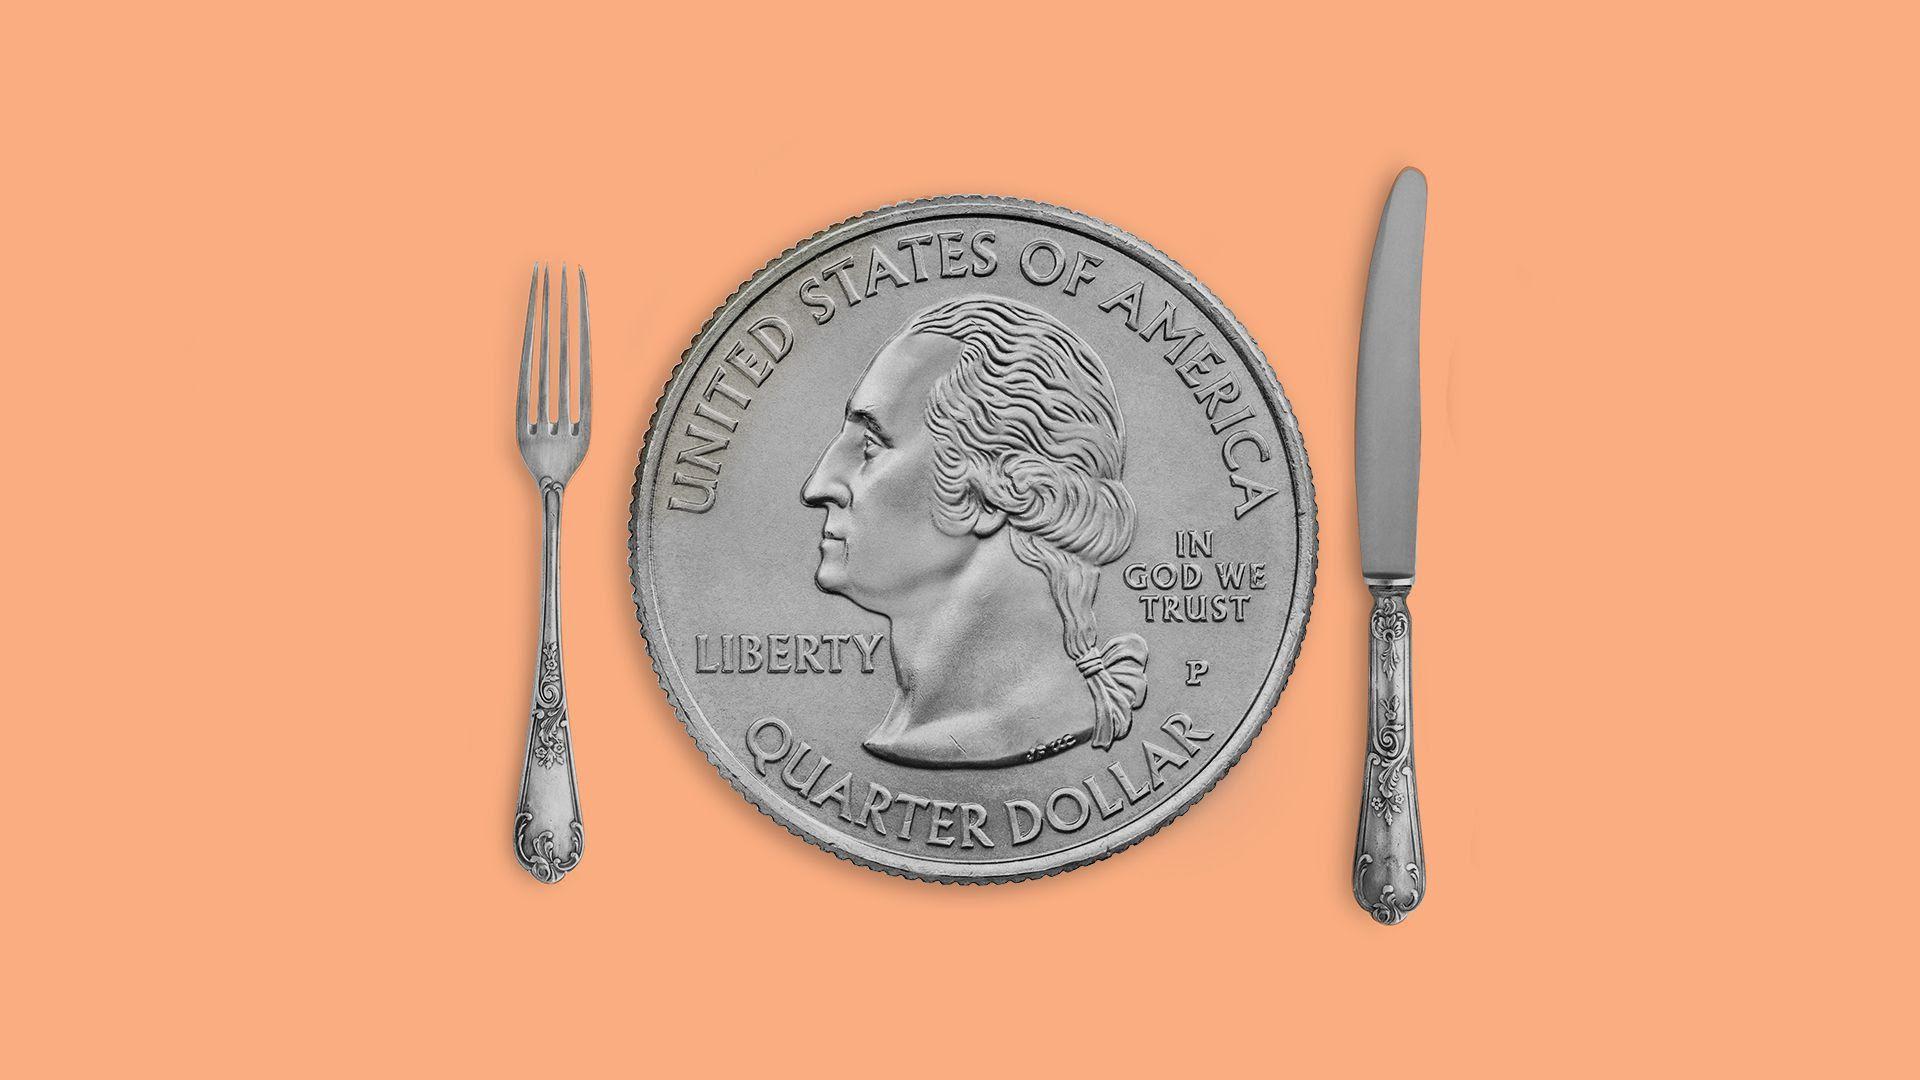 illustration as a quarter for a dinner plate